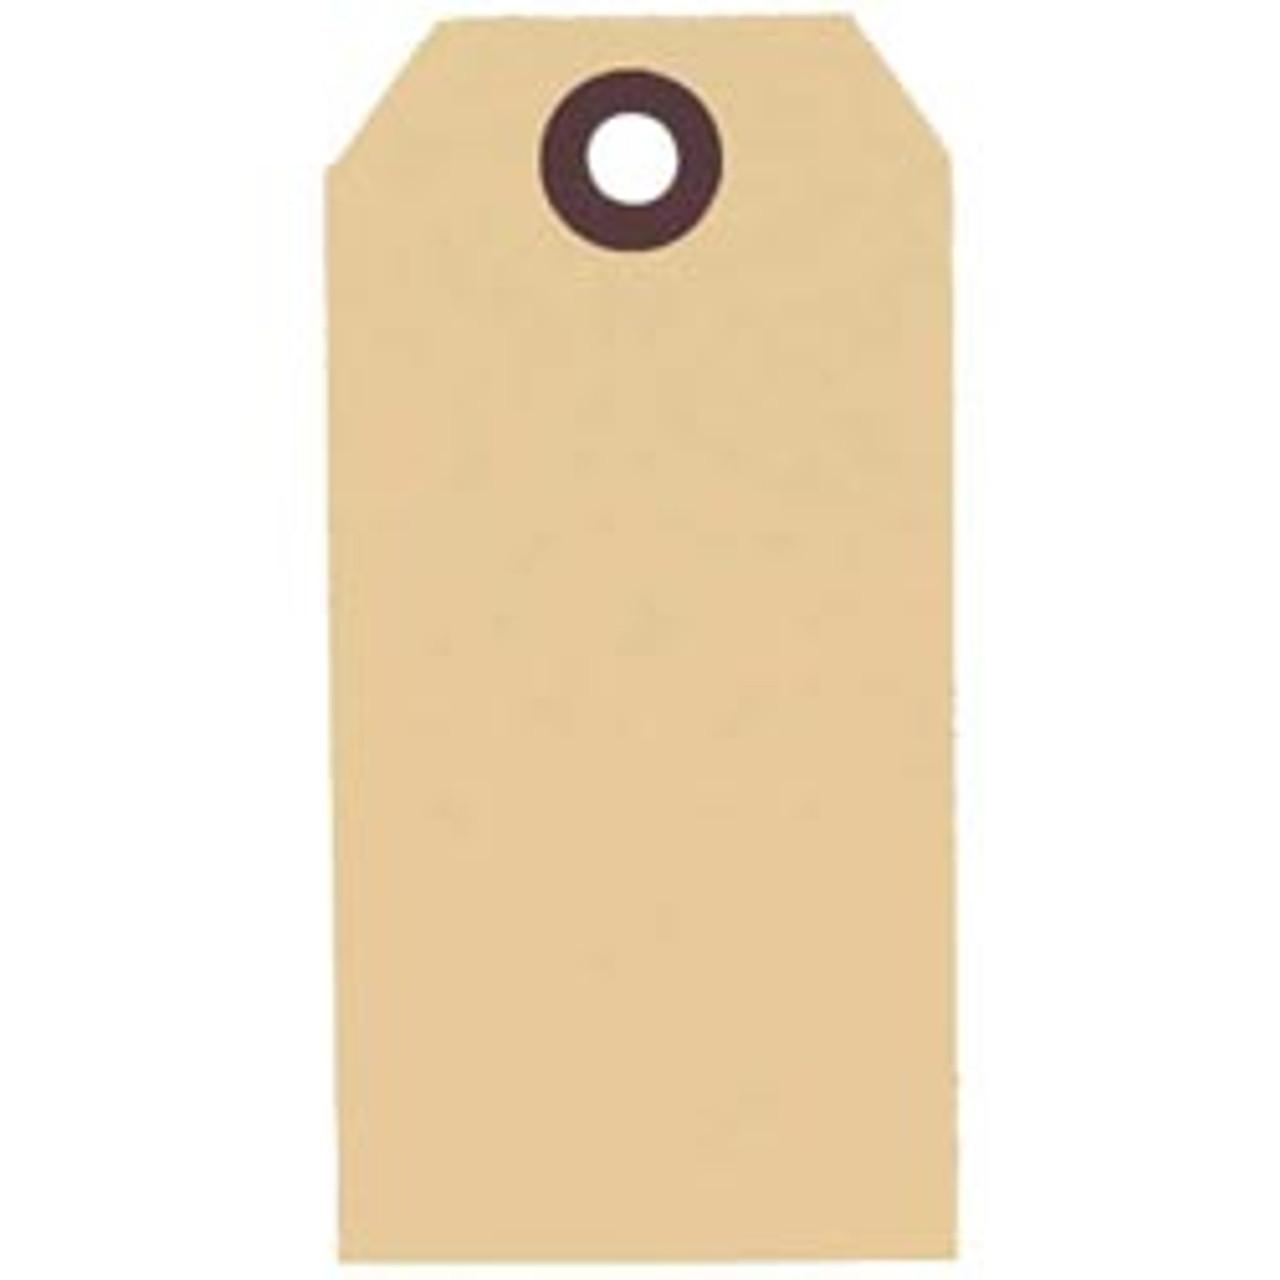 Plain #4 Manila Tags (1,000 per Box)